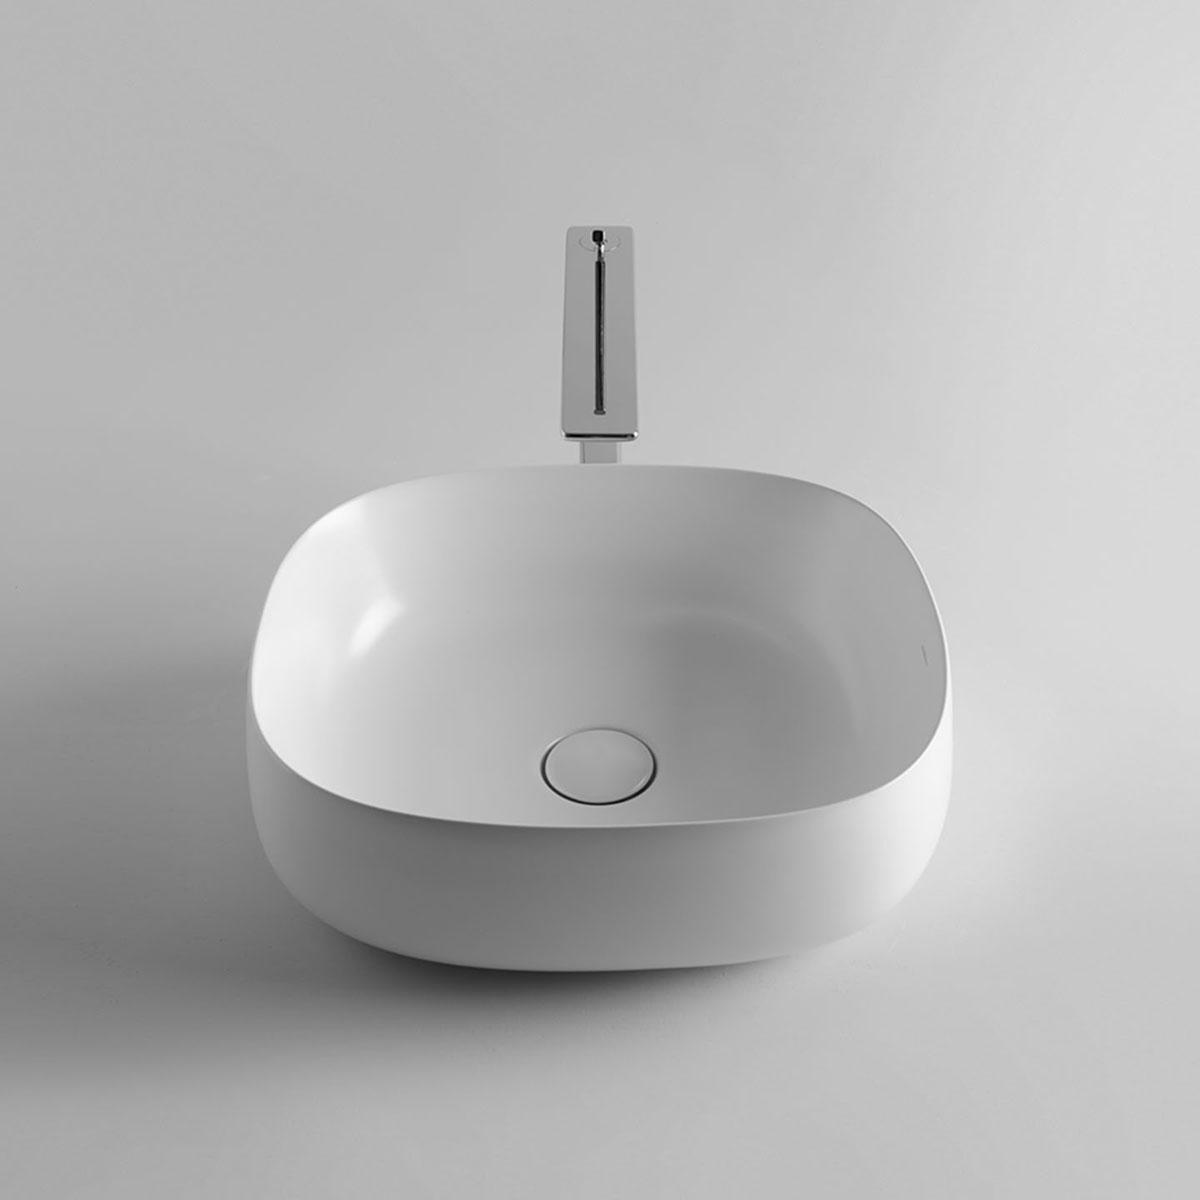 Seed 45.40 - SEL01 Bathroom Sink